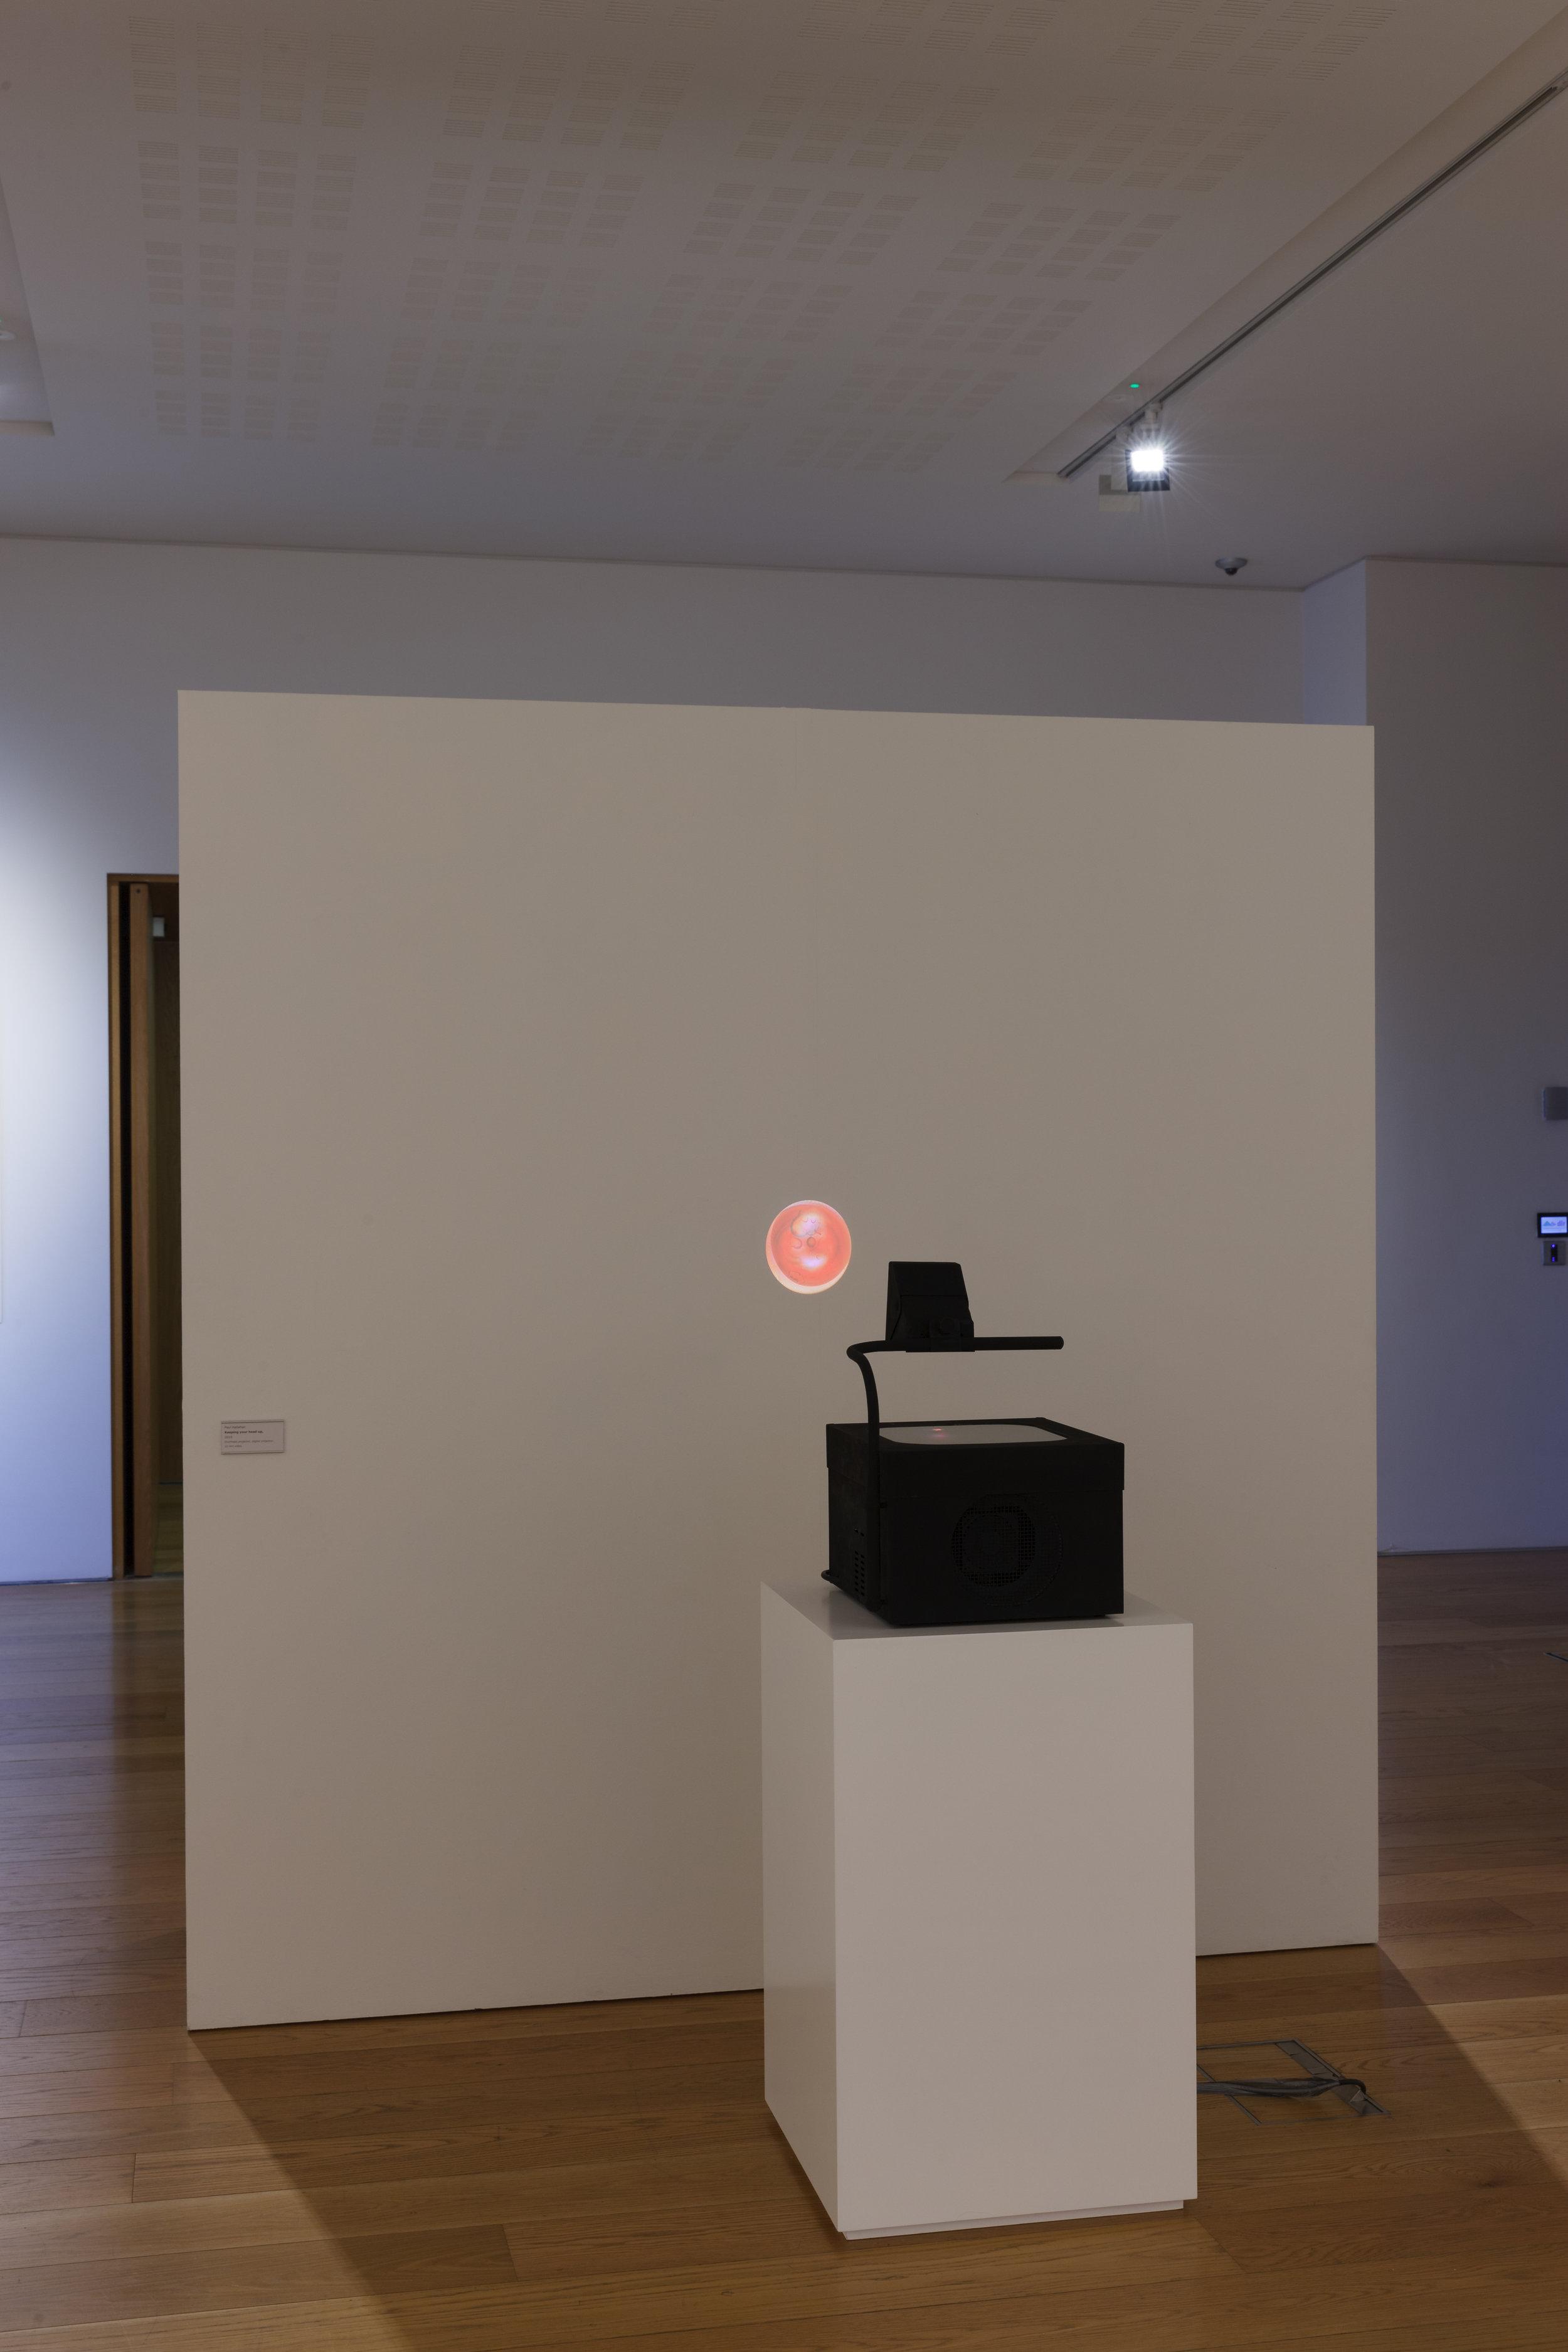 Keepimg your head up,  2019 36cm X 33cm X 48cm, digital video, overhead projector (10 mins)